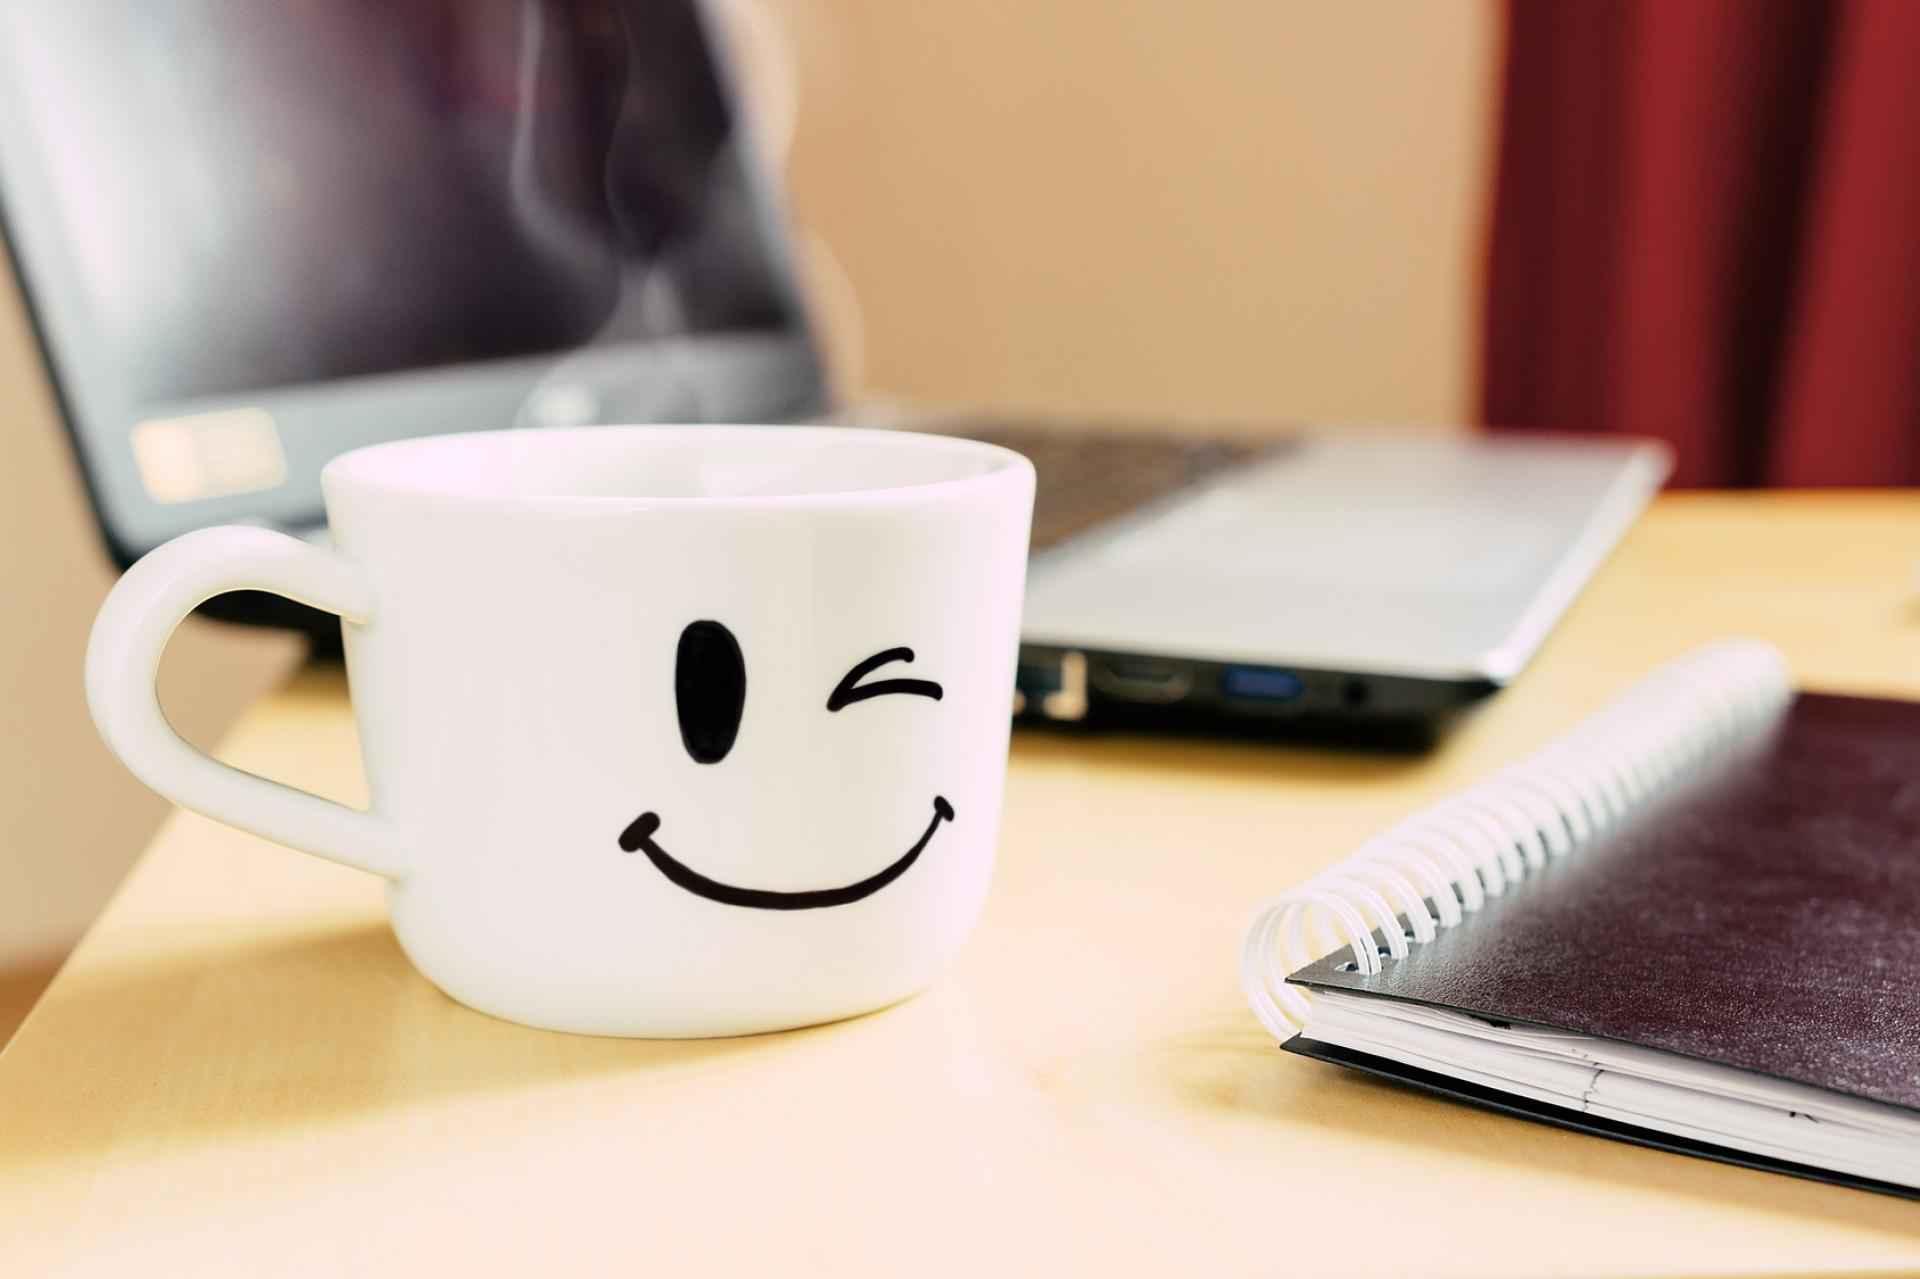 A Coffee Break or Masturbation Time at Work? SDC.com